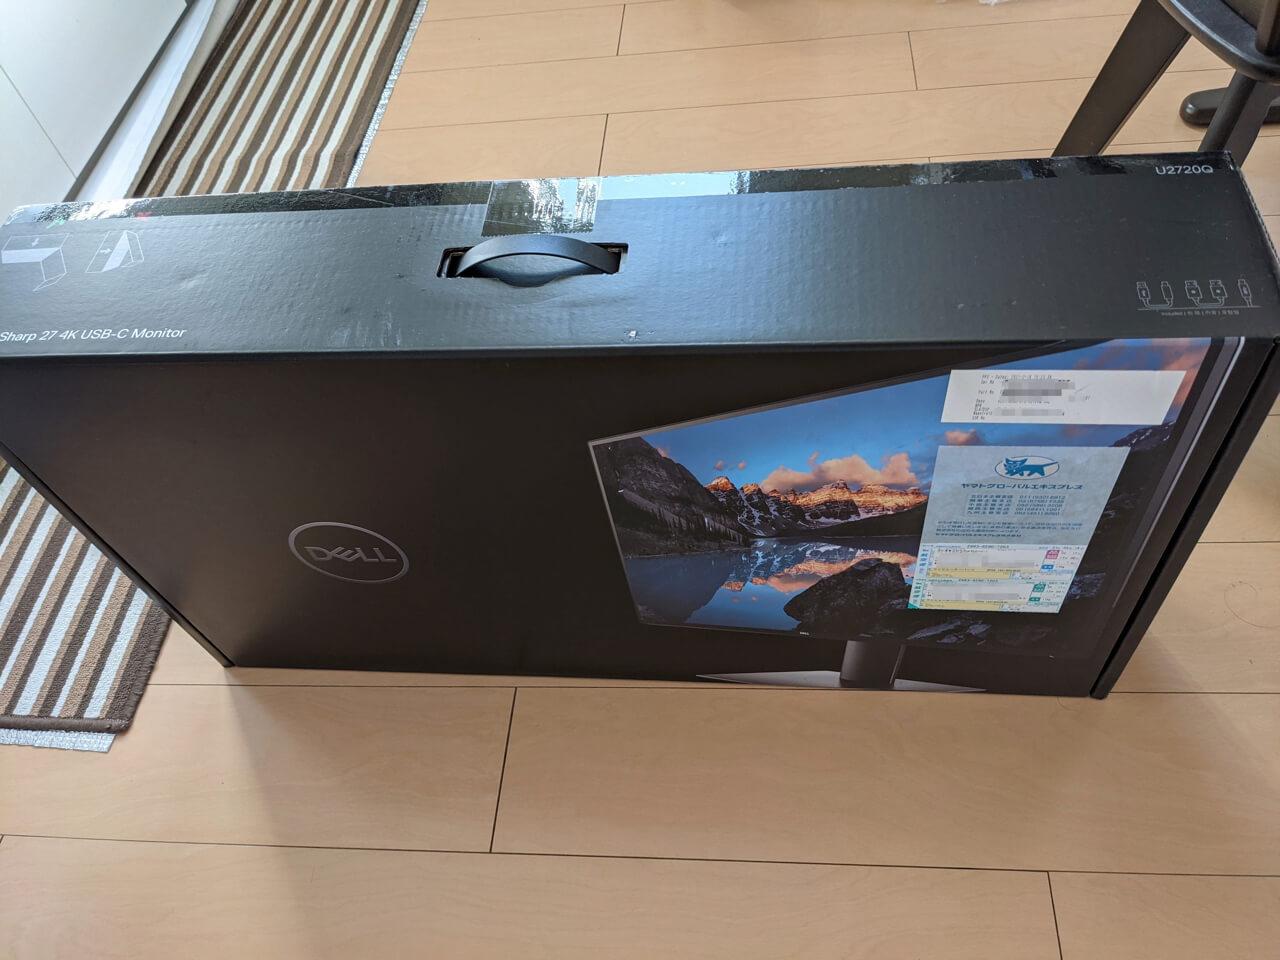 Dell U2720QM 12